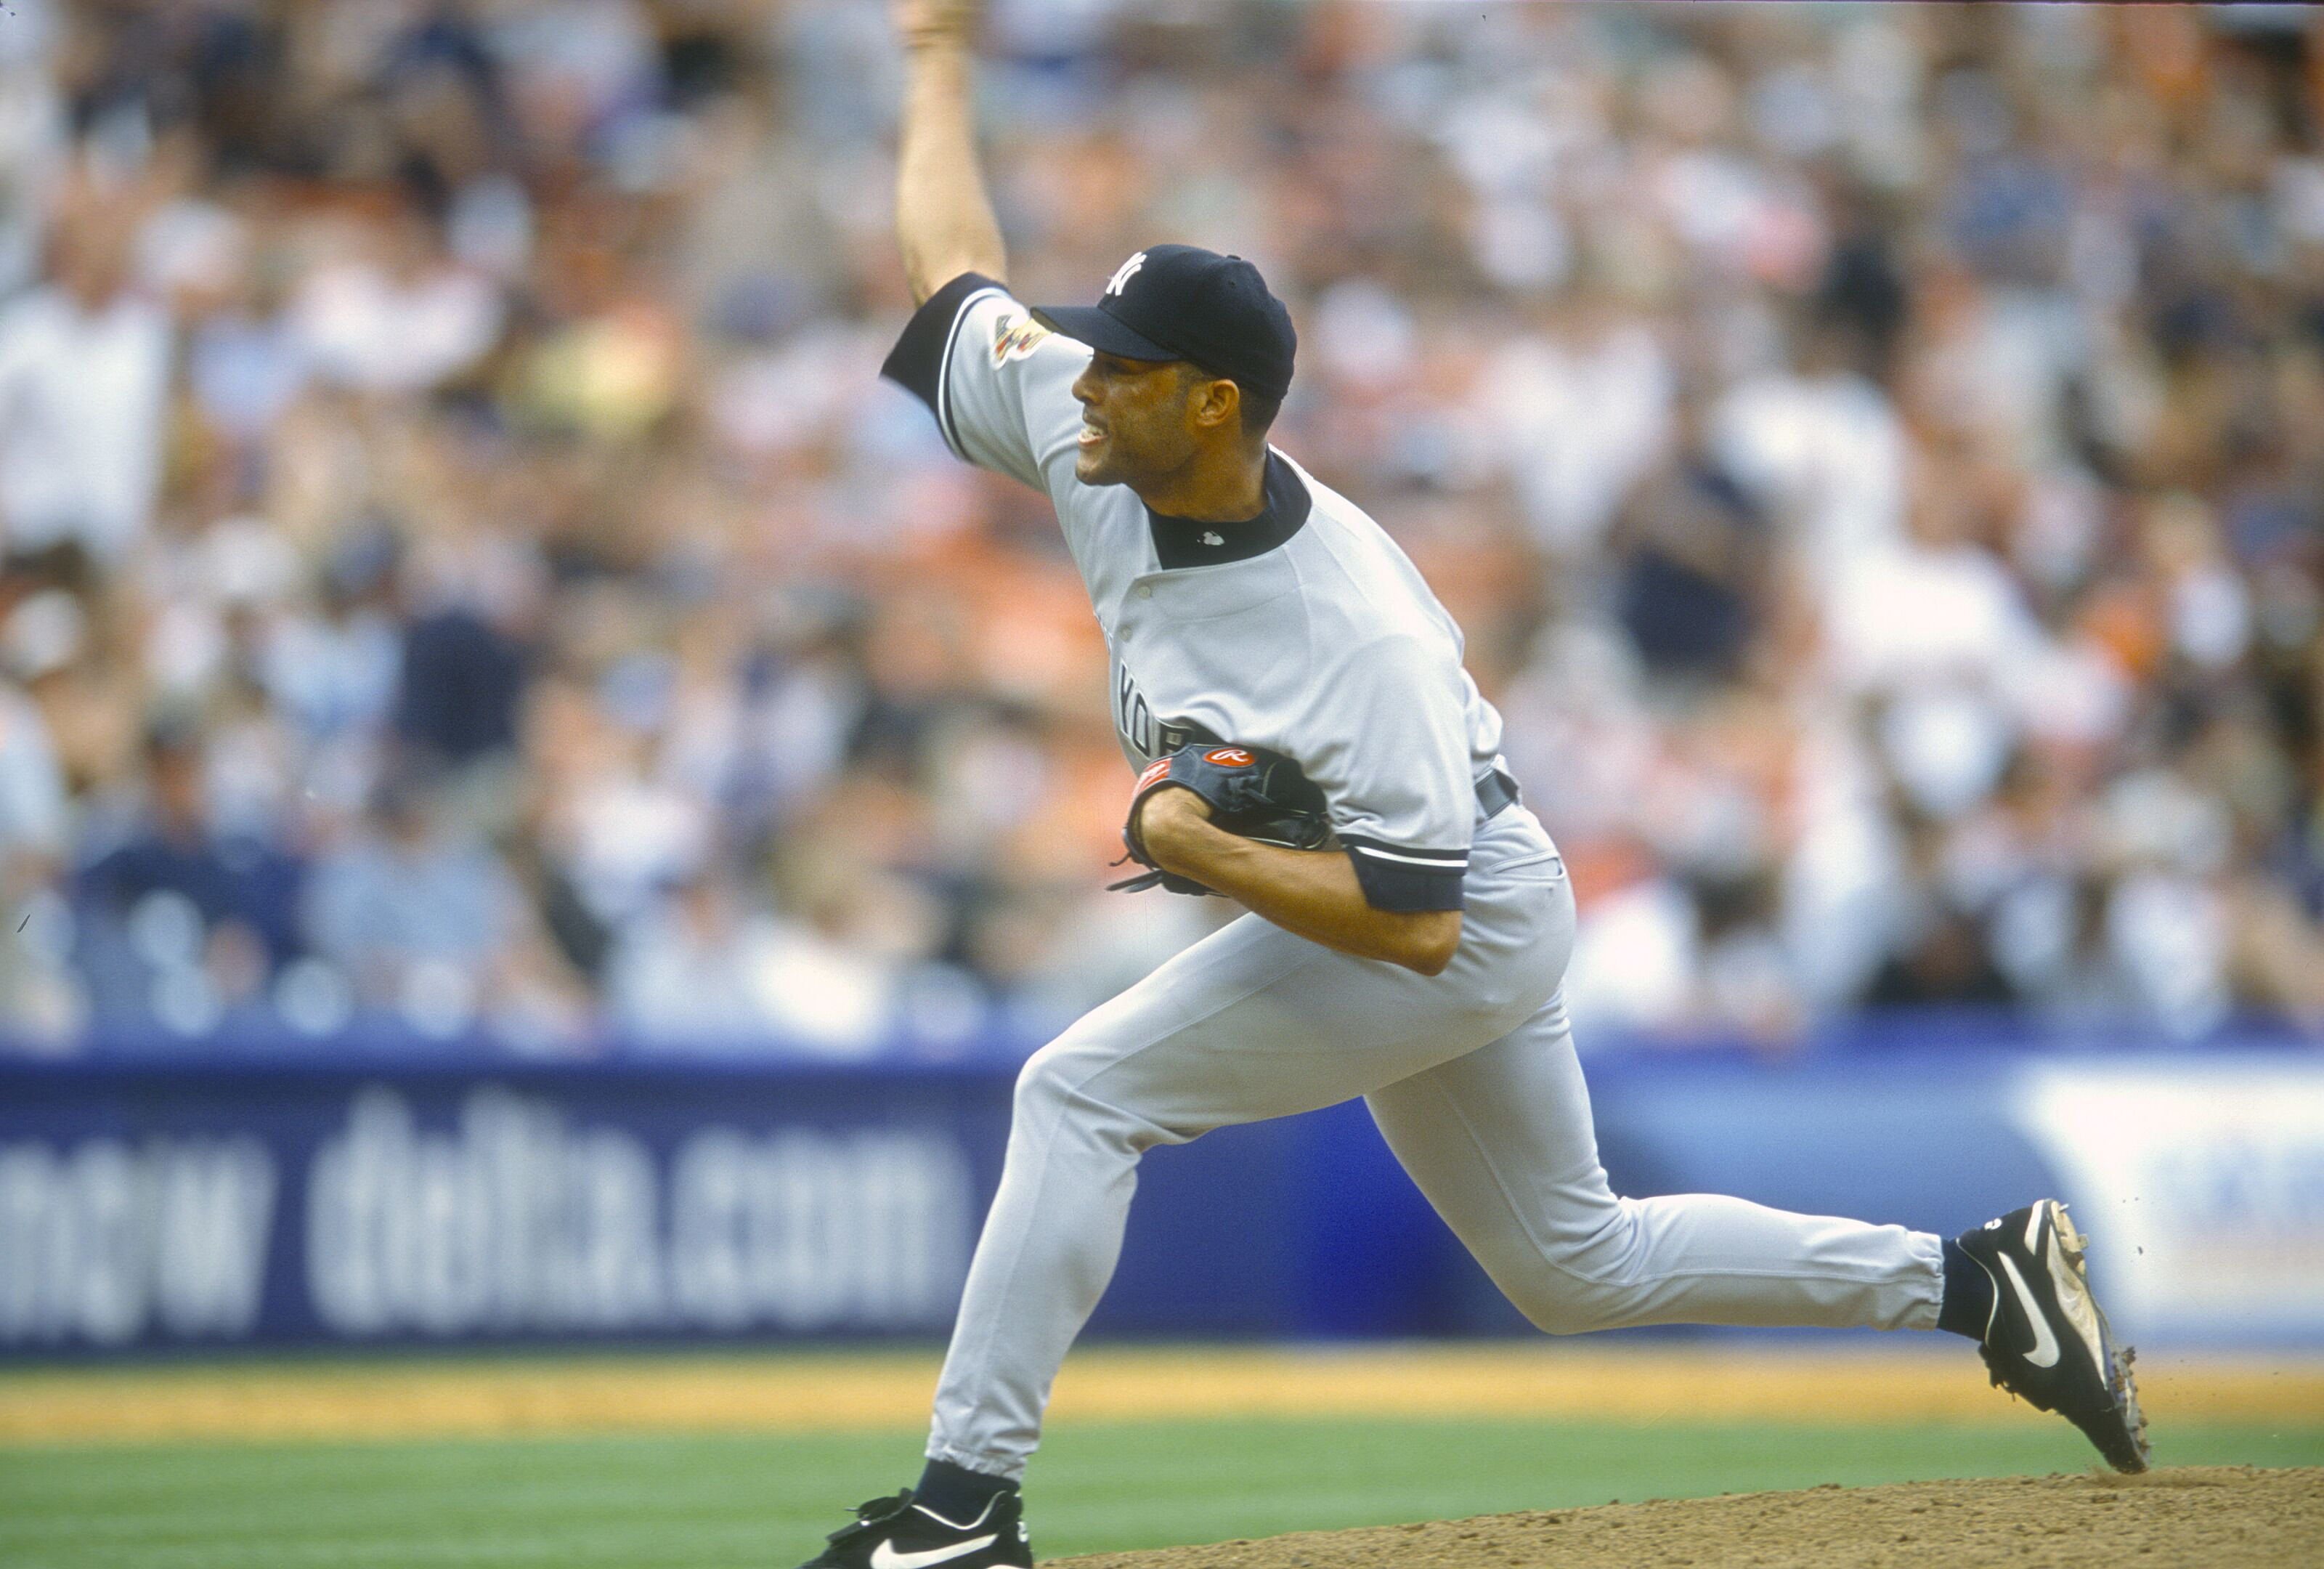 Yankees: Mariano Rivera enters the baseball Hall of Fame